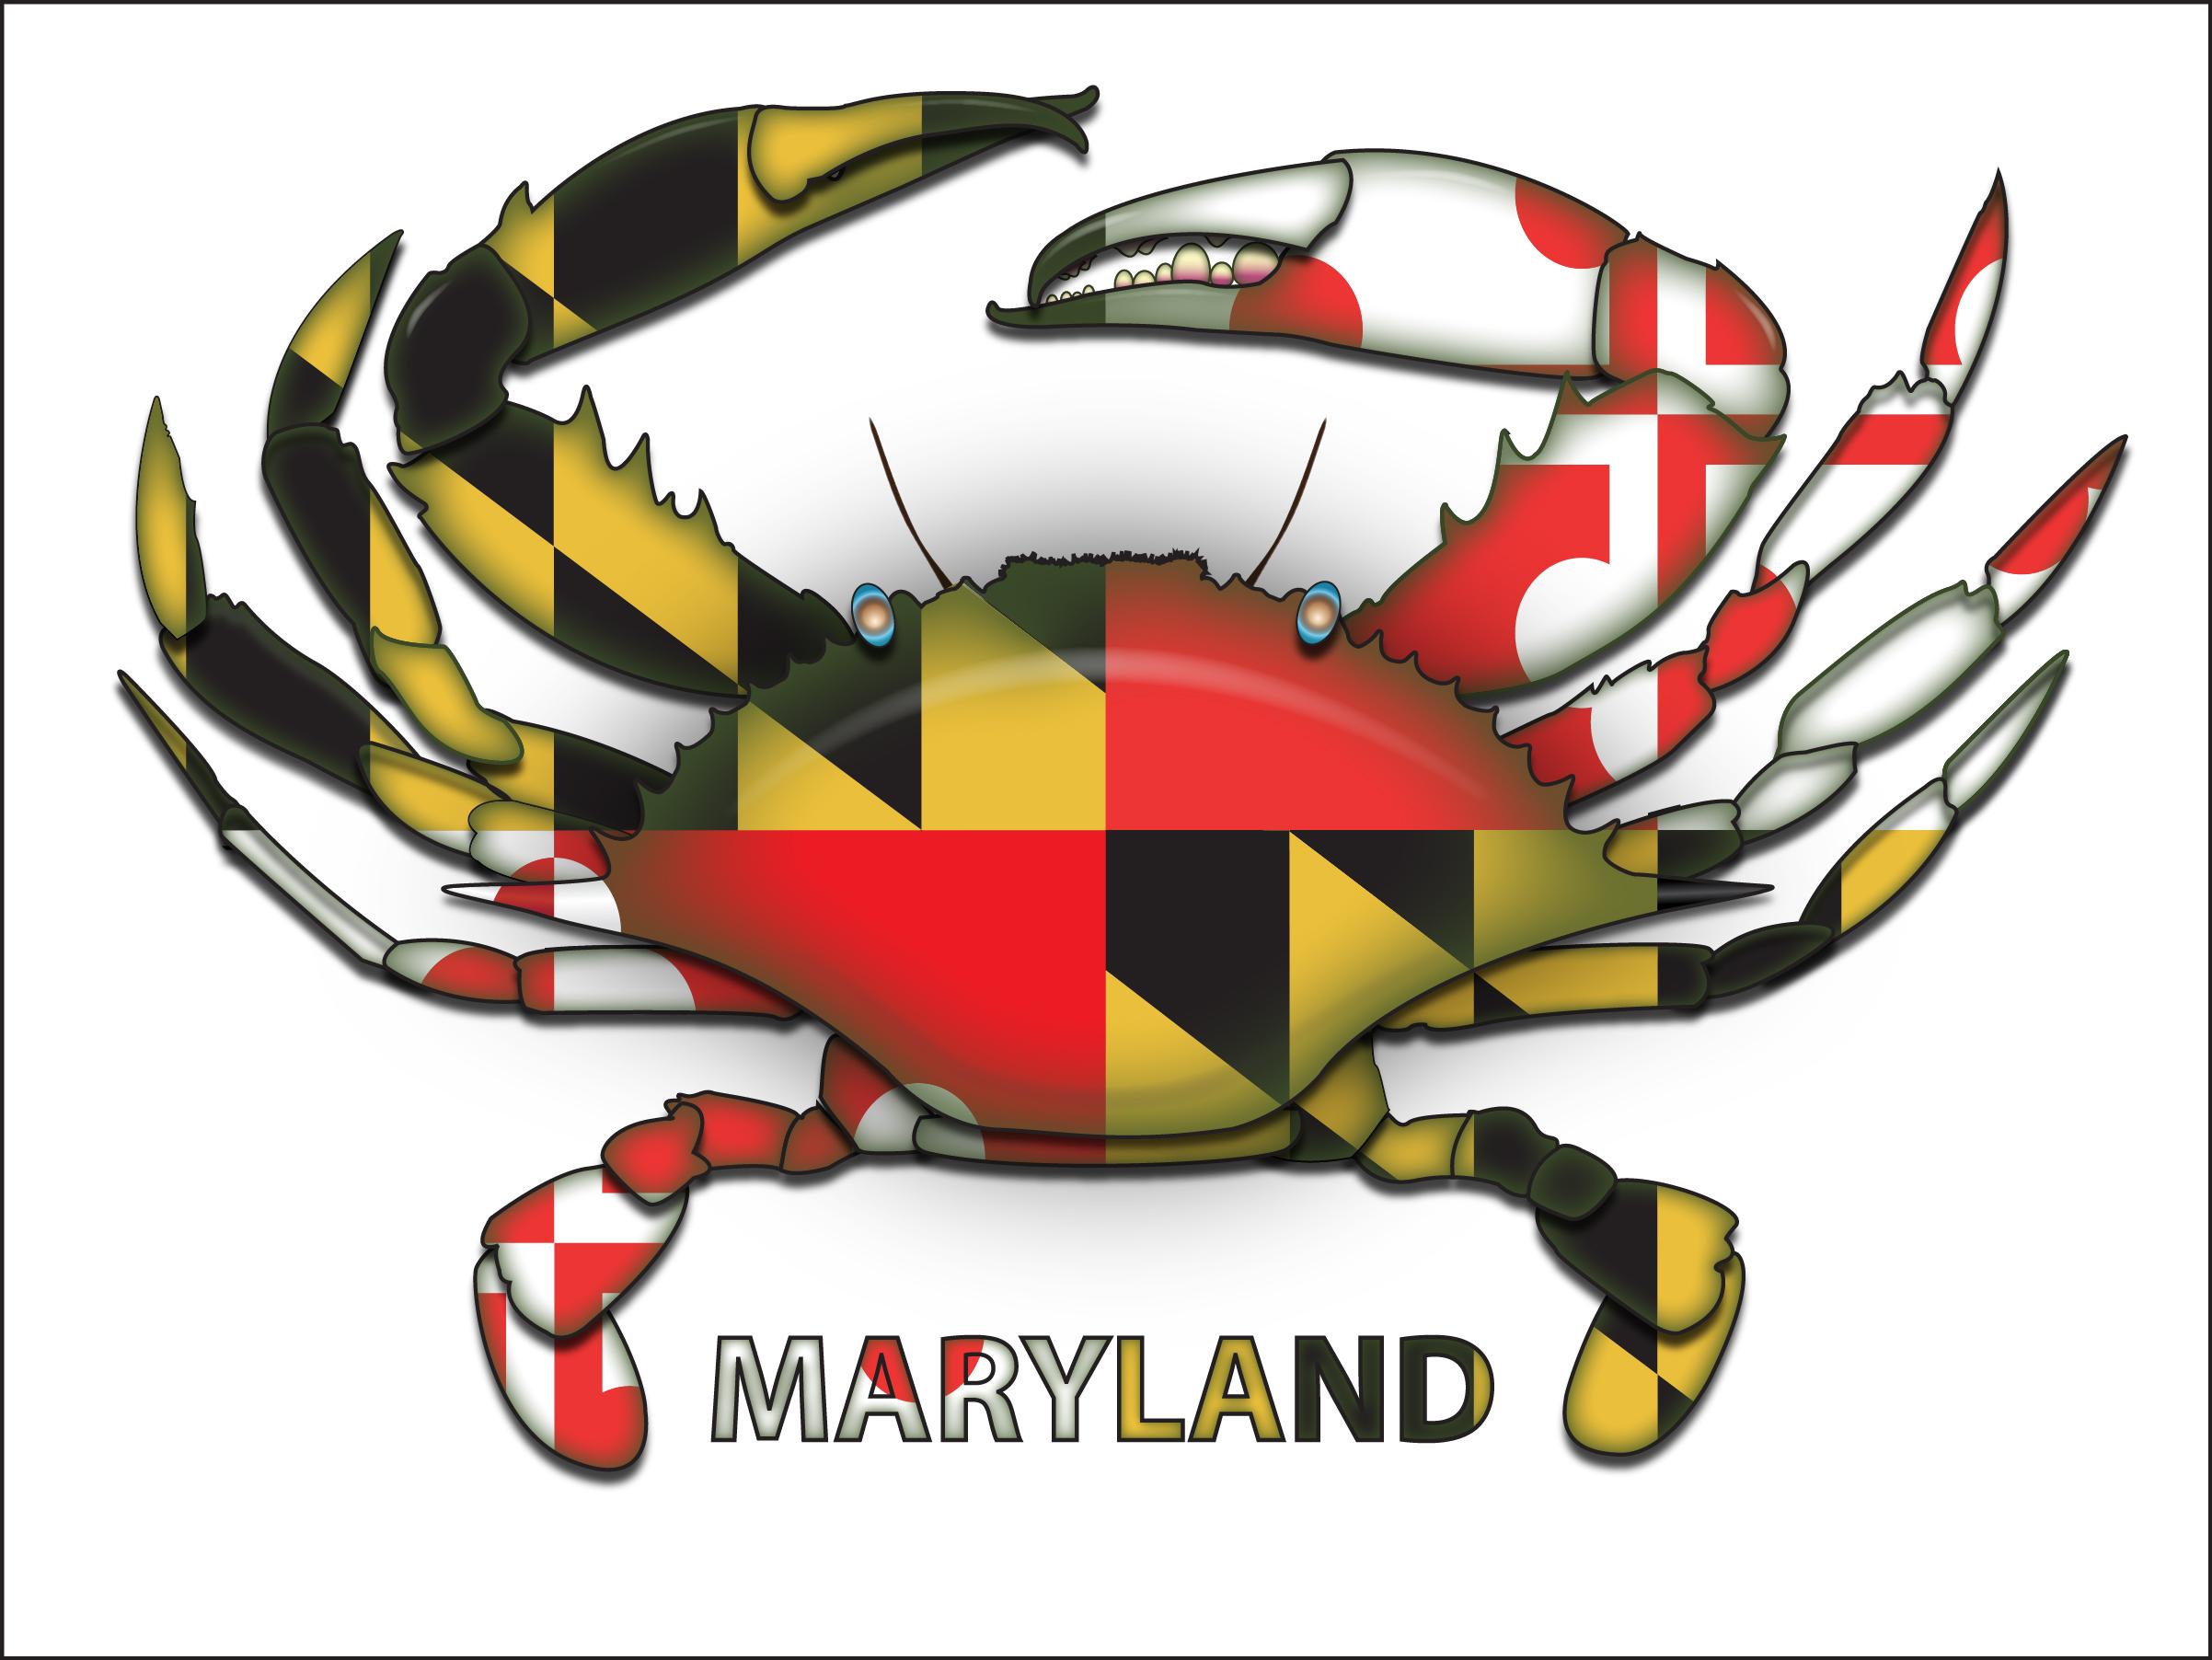 Maryland Flag Design Ladies 2442x1876